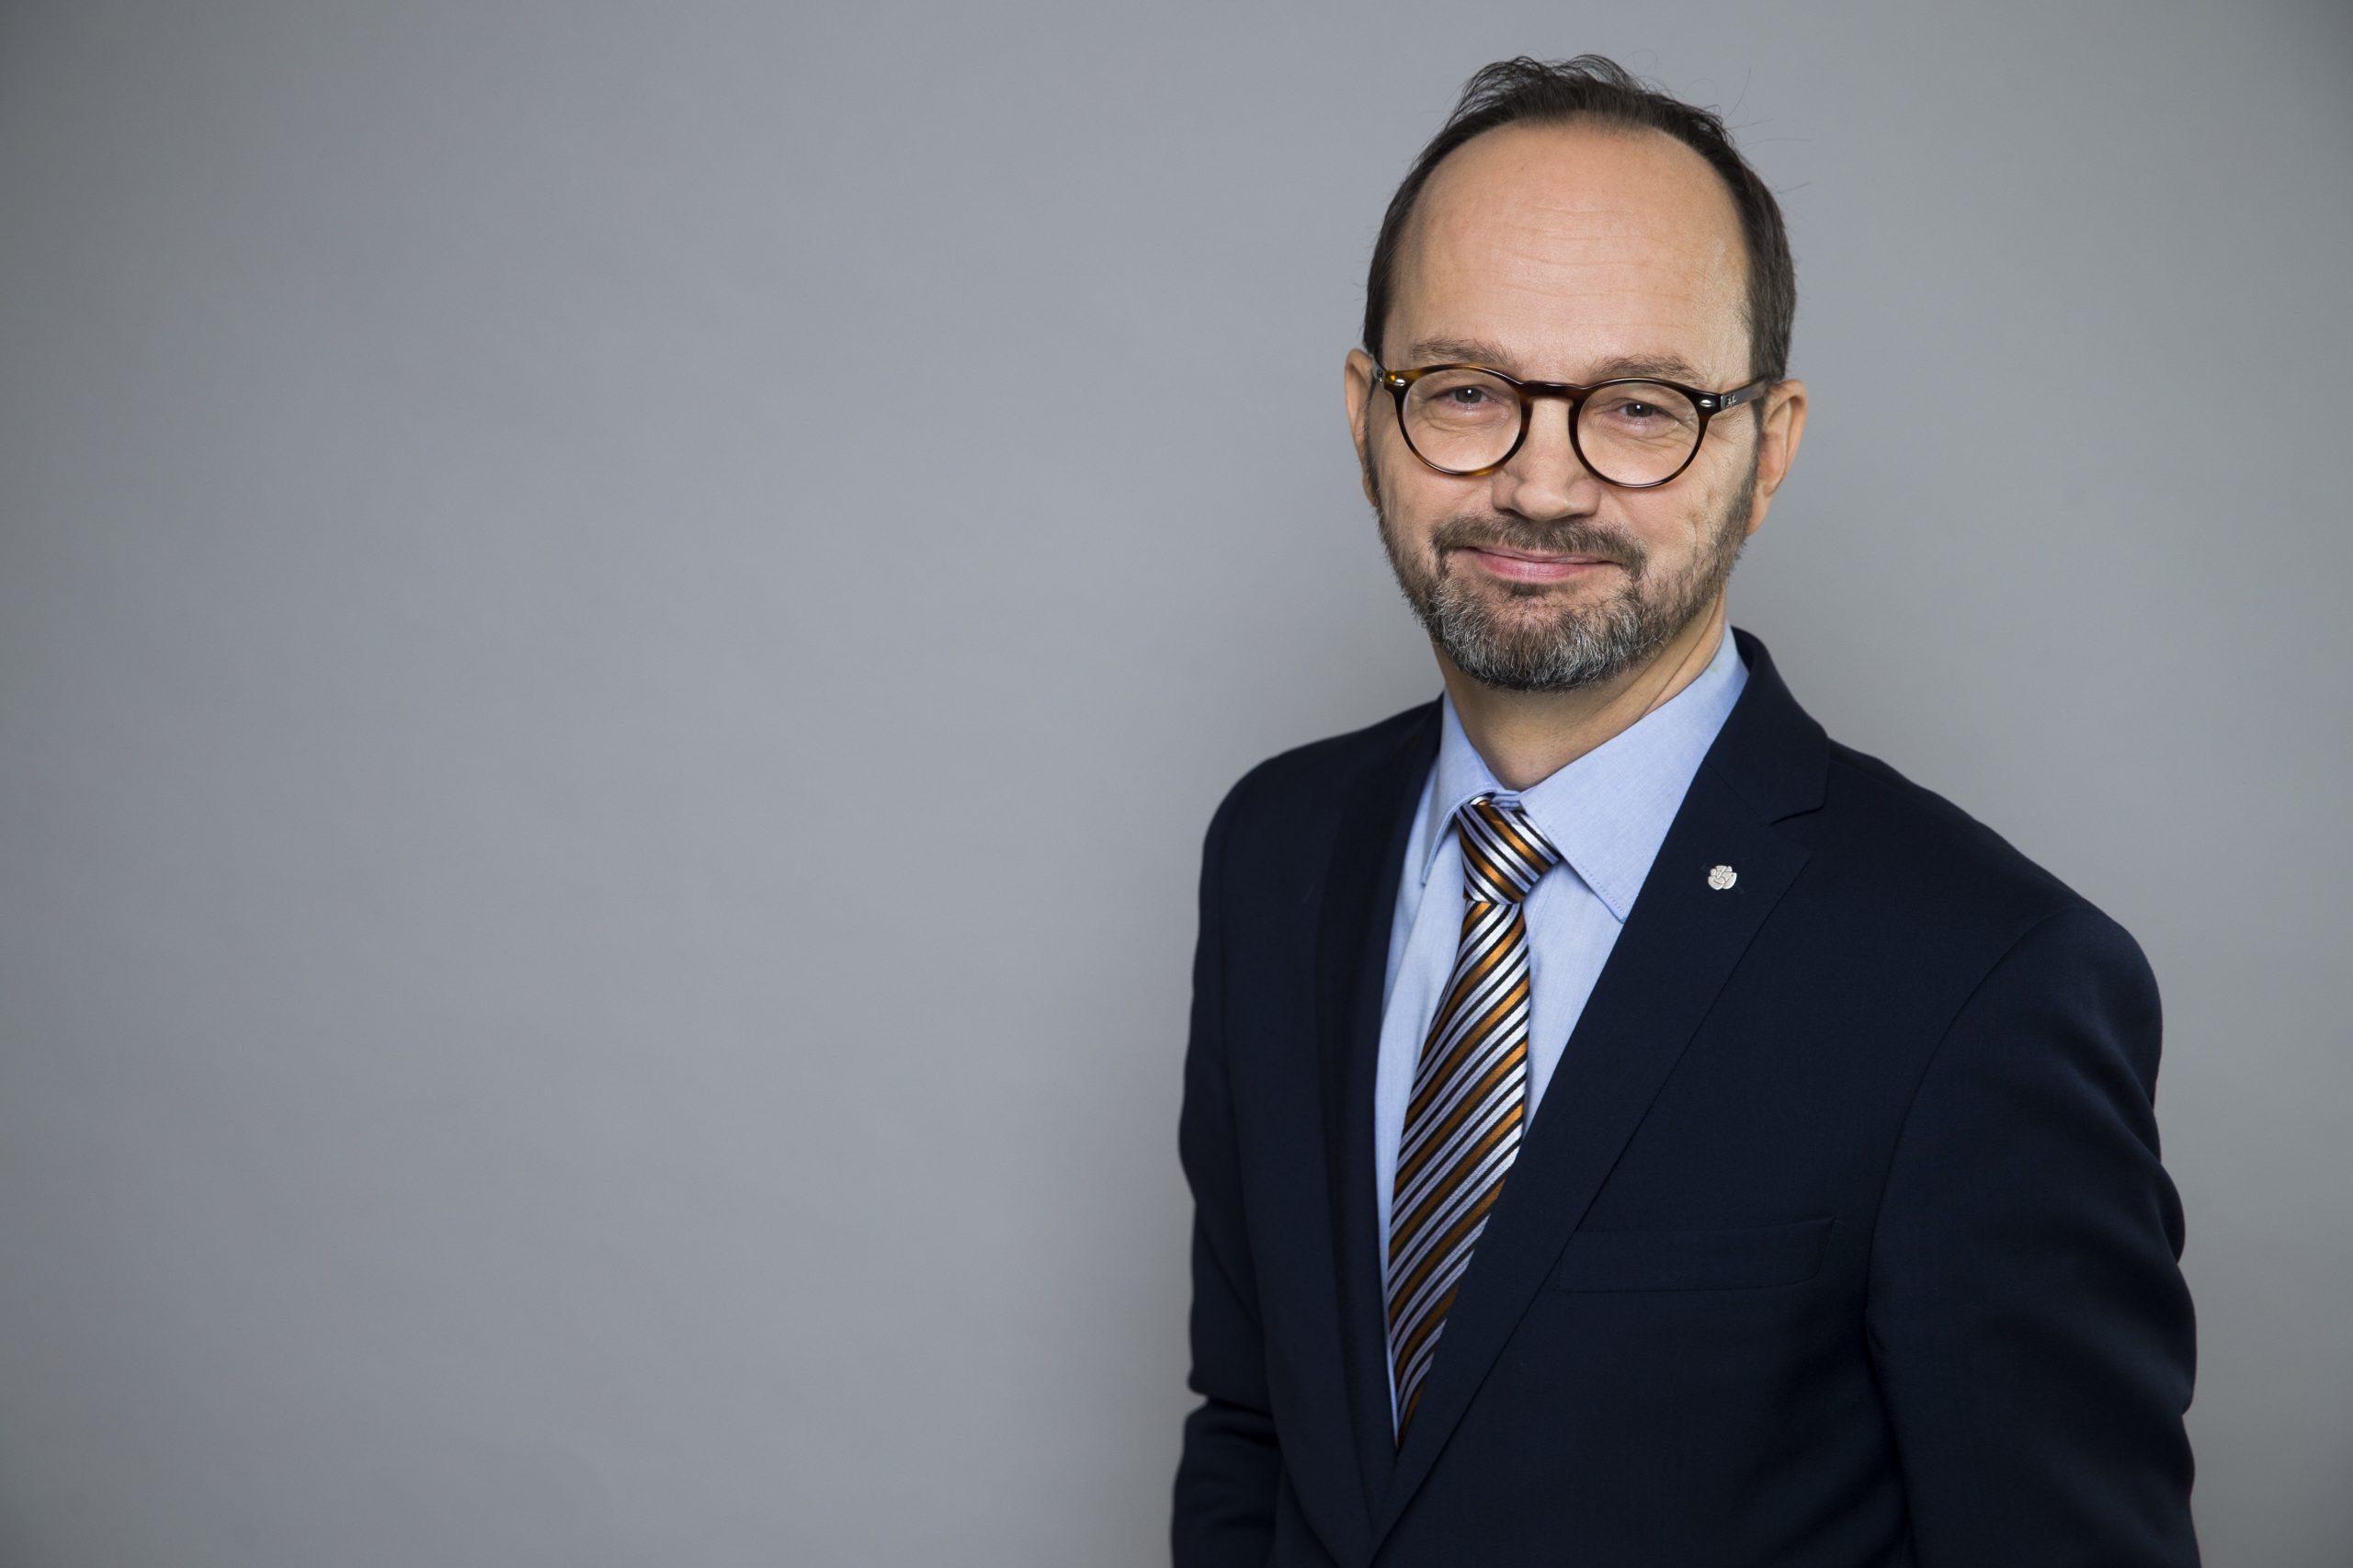 Tomas Eneroth Infrastrukturminister i Sverige. (Foto: Kristian Pohl/Regeringskansliet)